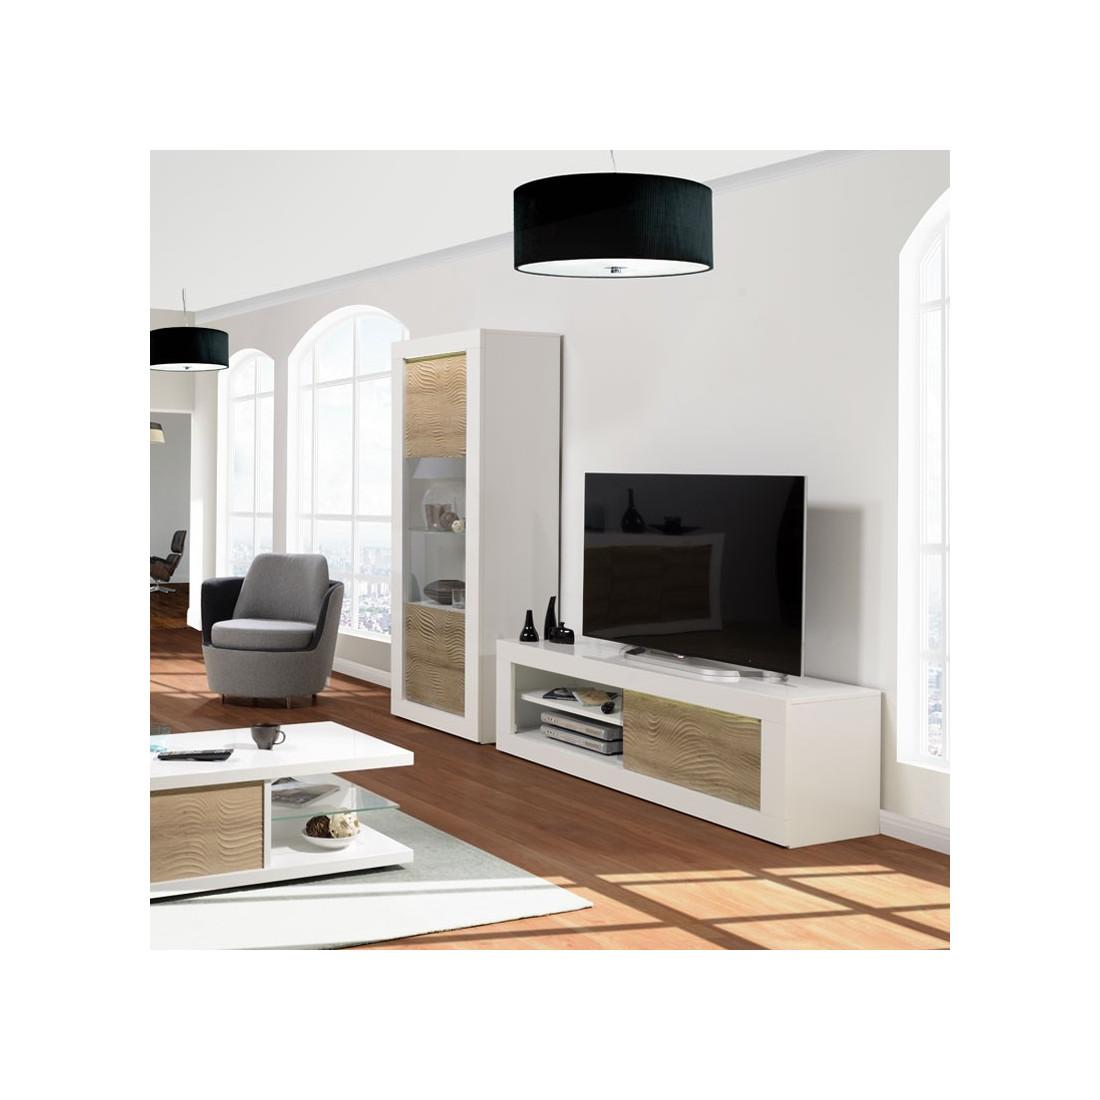 Meuble Tv 1 Porte Coulissante Blanc Chene Clair A Leds Marks Salon